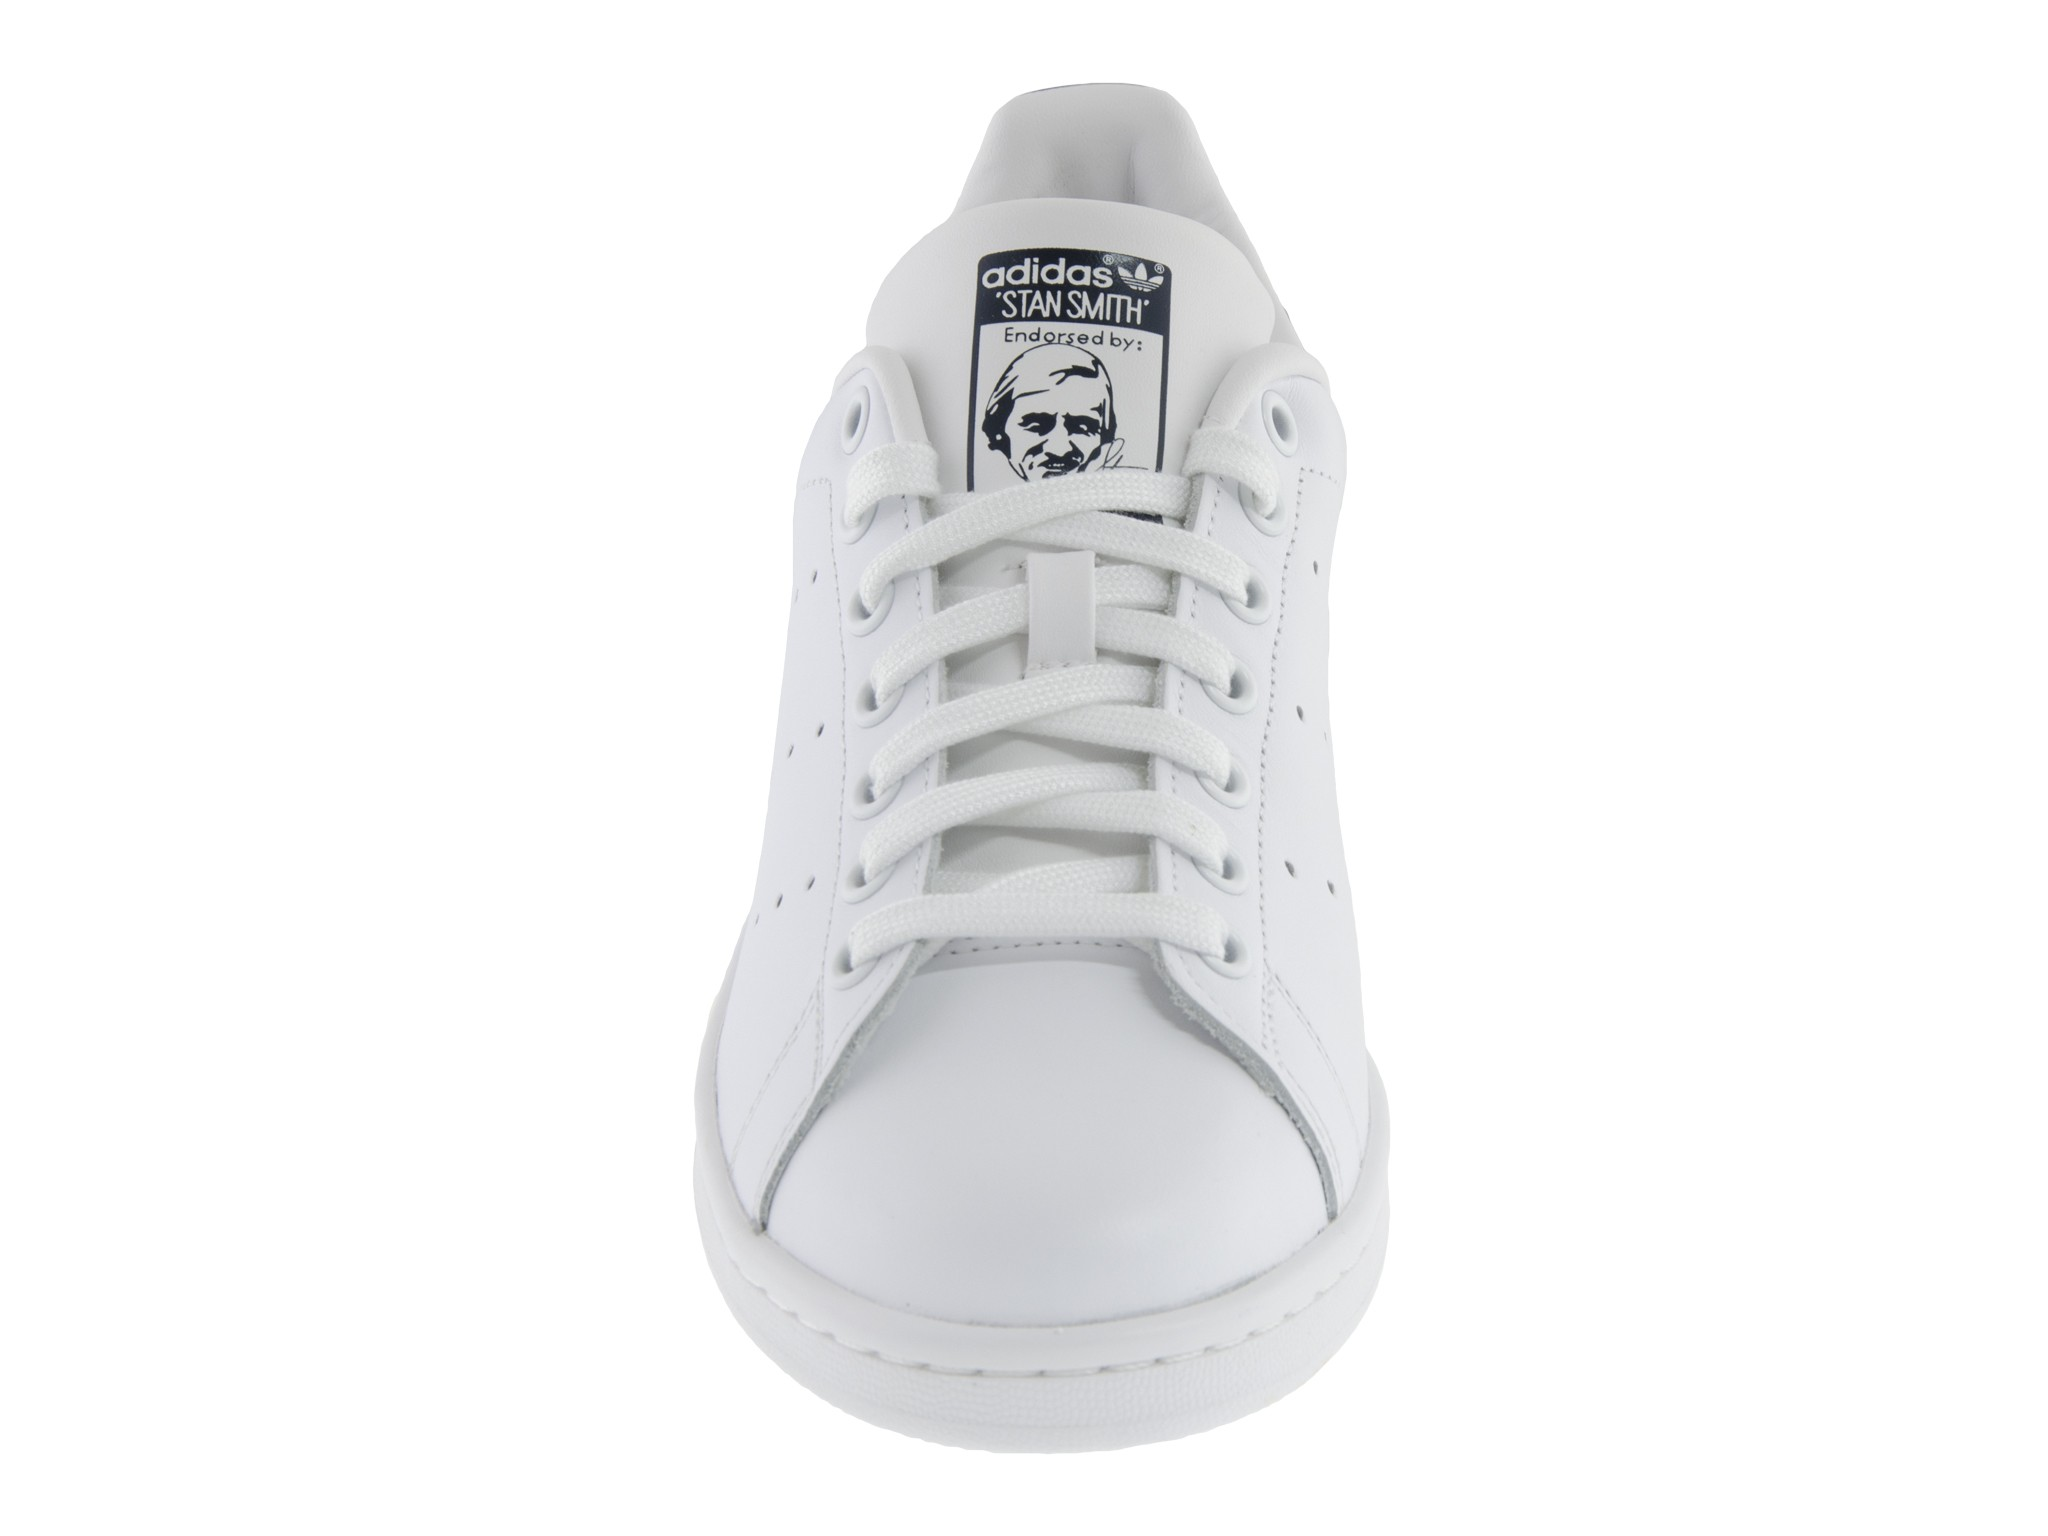 promo code ab38c dacd4 scarpe-adidas-stan-smith-uomo-bianco-e-blu.jpg